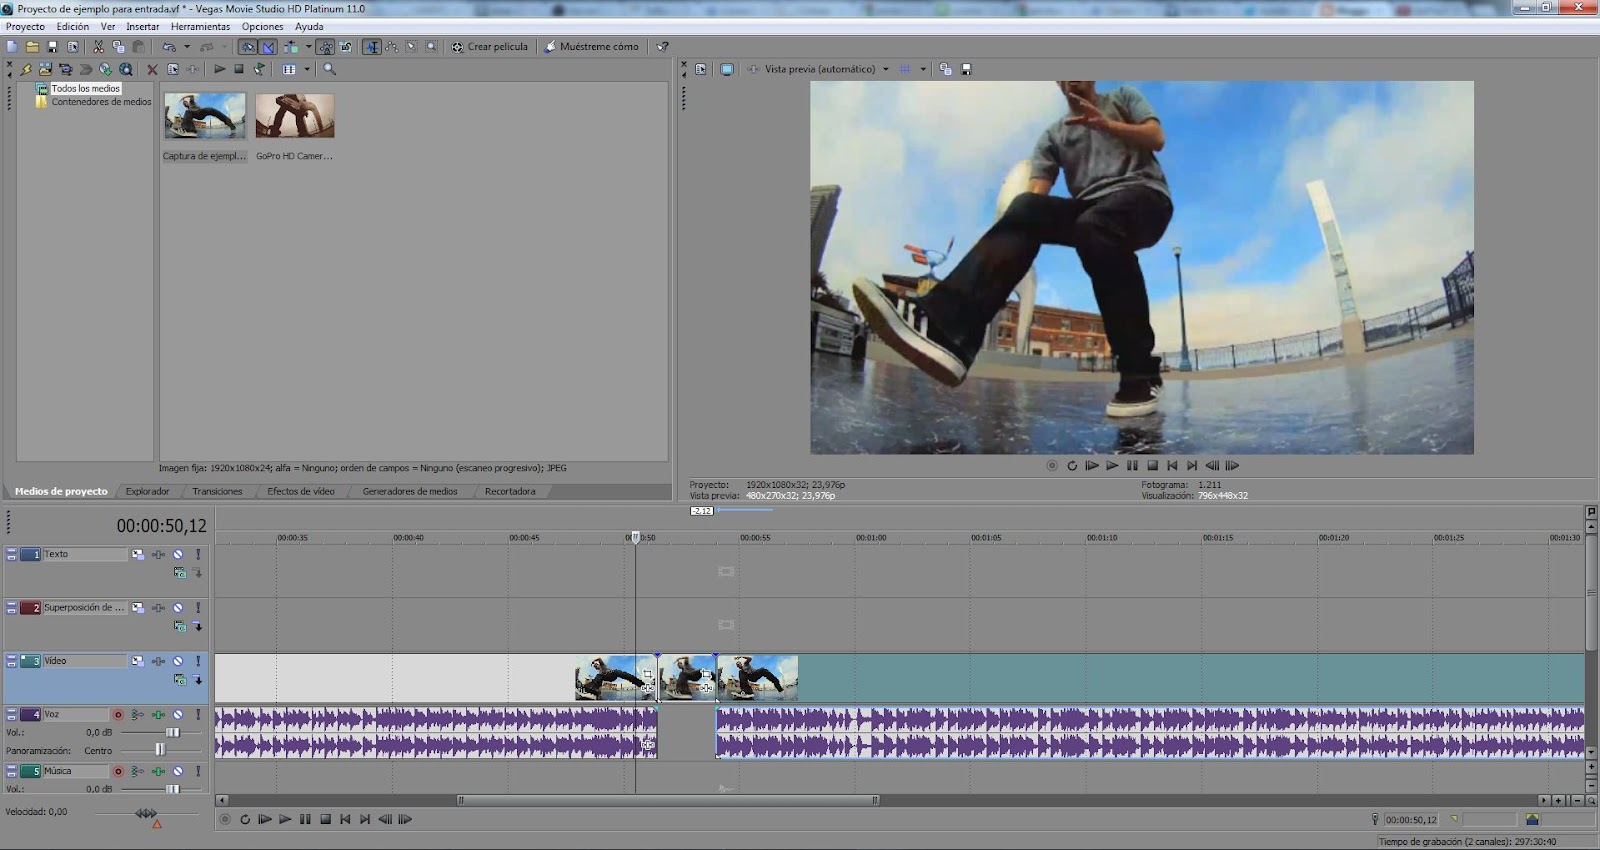 AYTUTO: Congelar la imagen en SONY VEGAS STUDIO HD